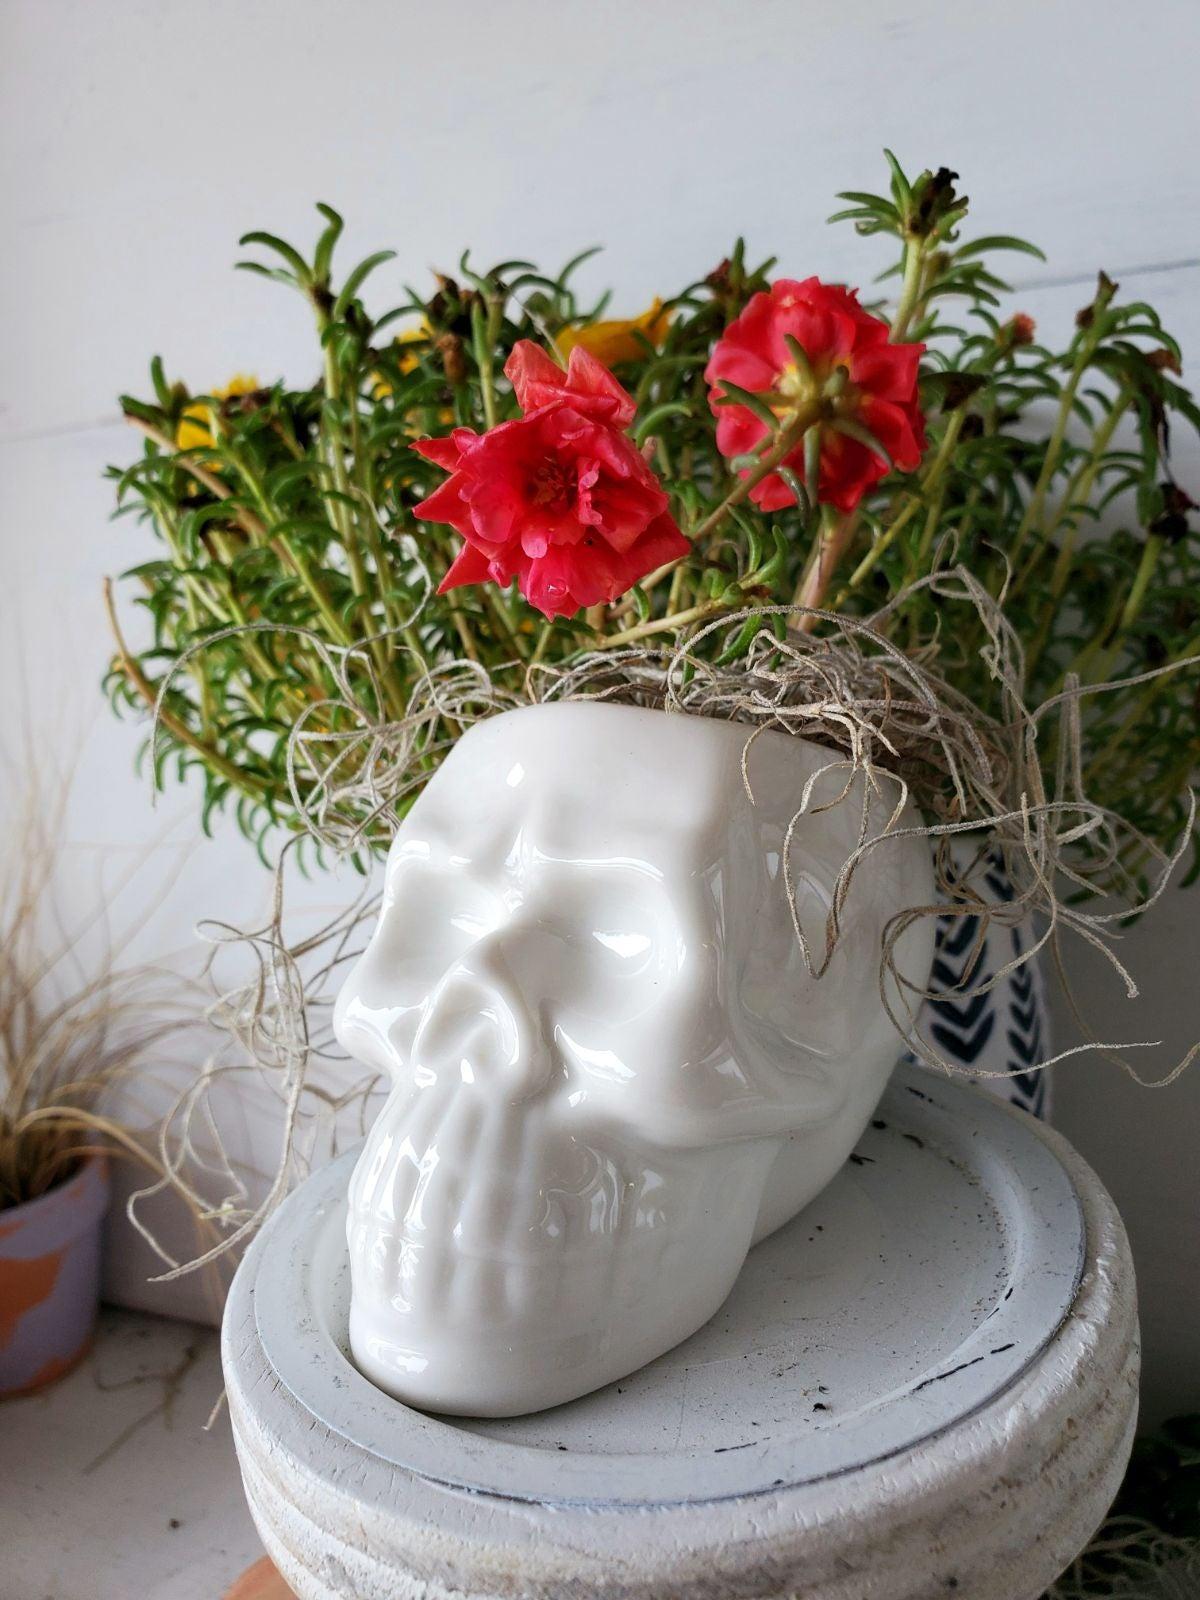 Ceramic Skull Planter & Live Air Plant